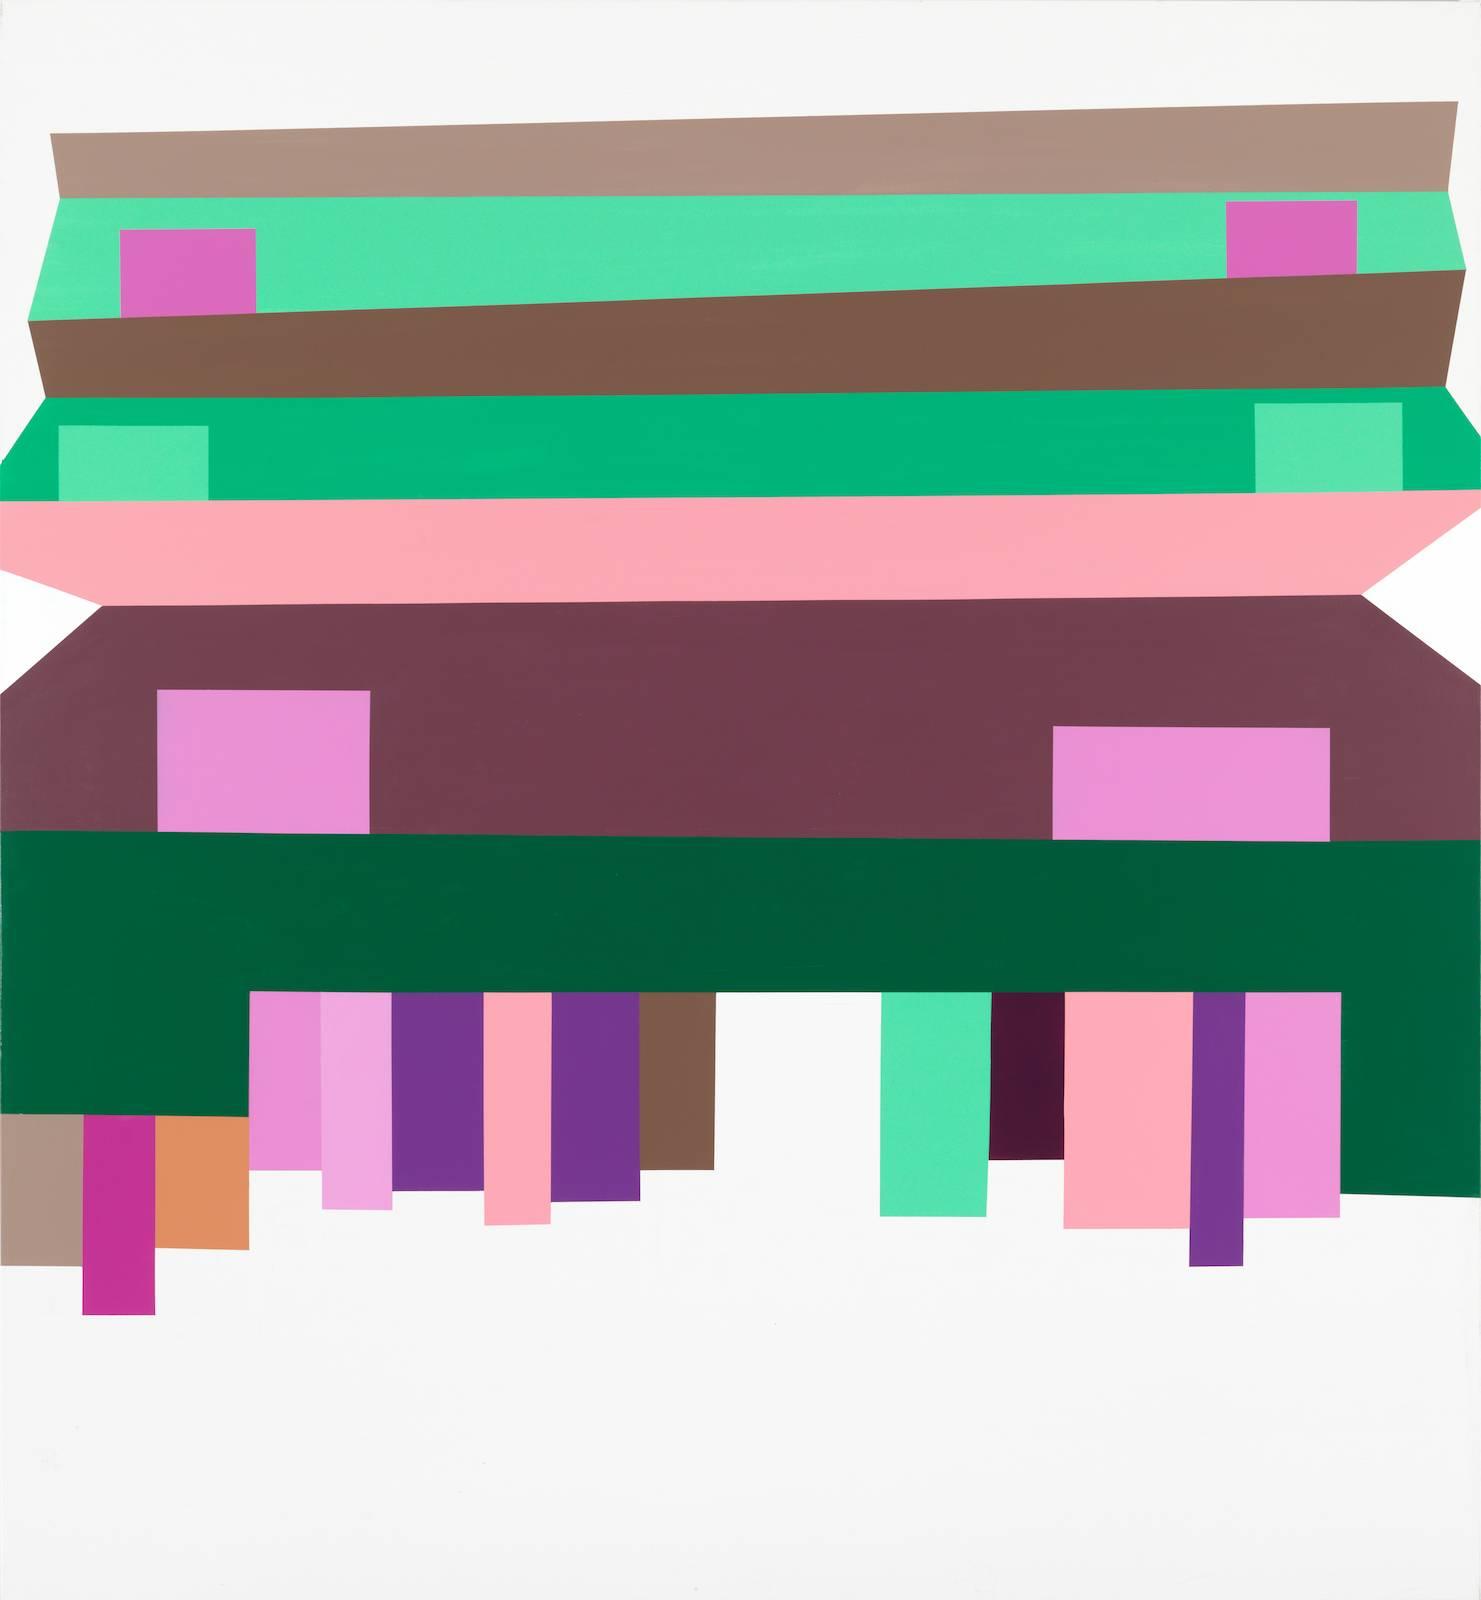 Panorama/The Second Generation, No.01 Marguerita, 2011/12, acrylic on canvas, 265 x 245 cm